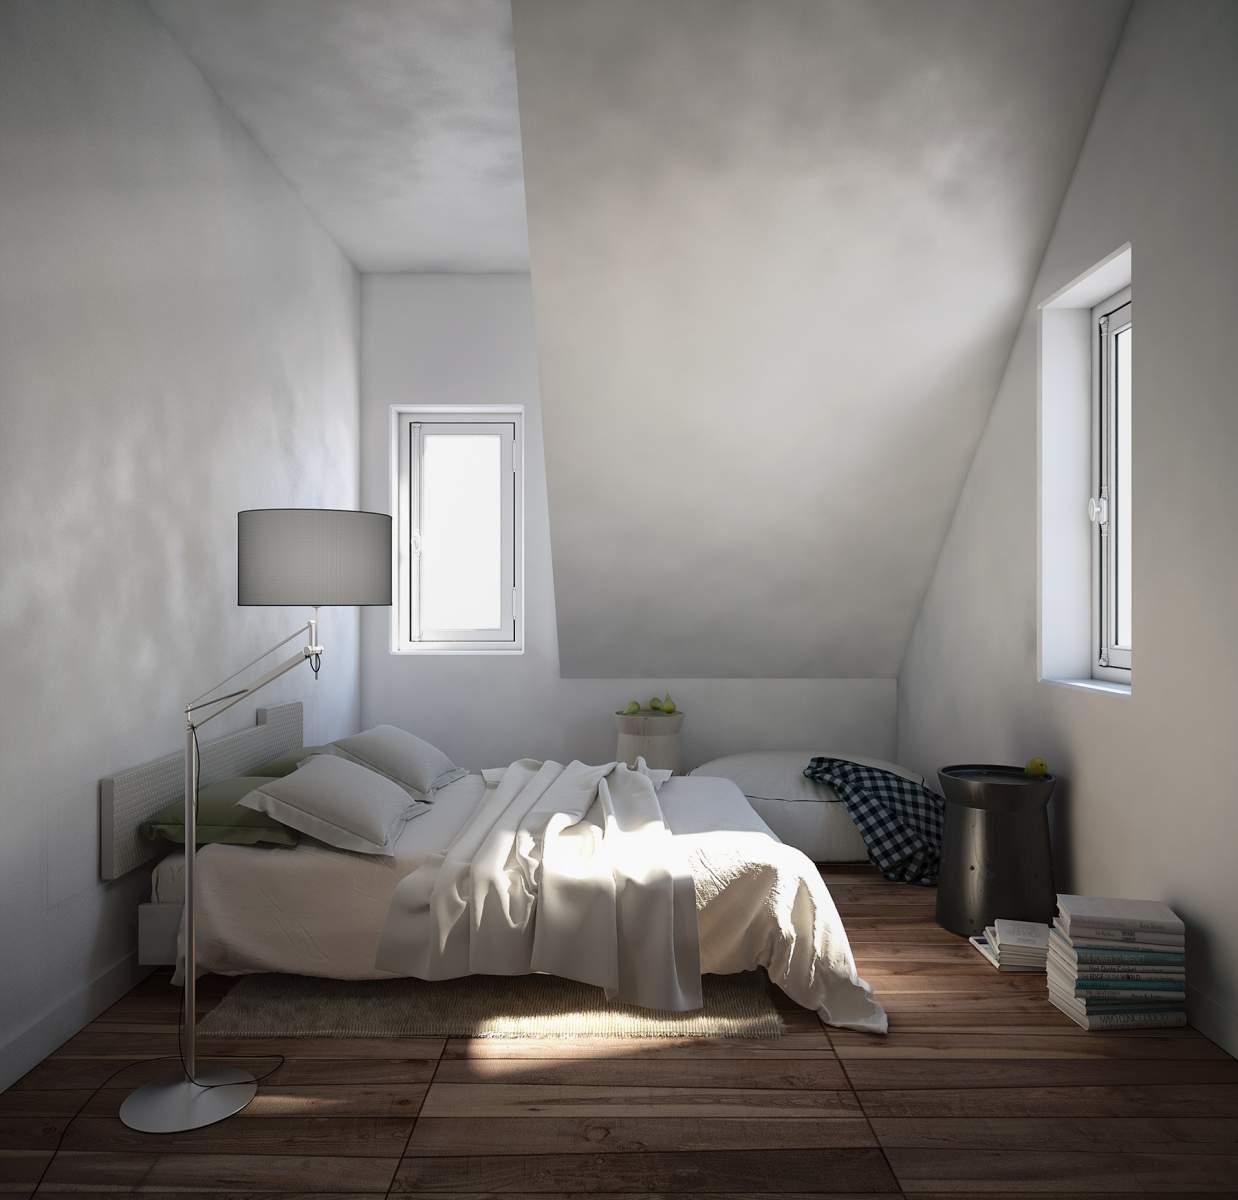 Chambre sous les toits #1